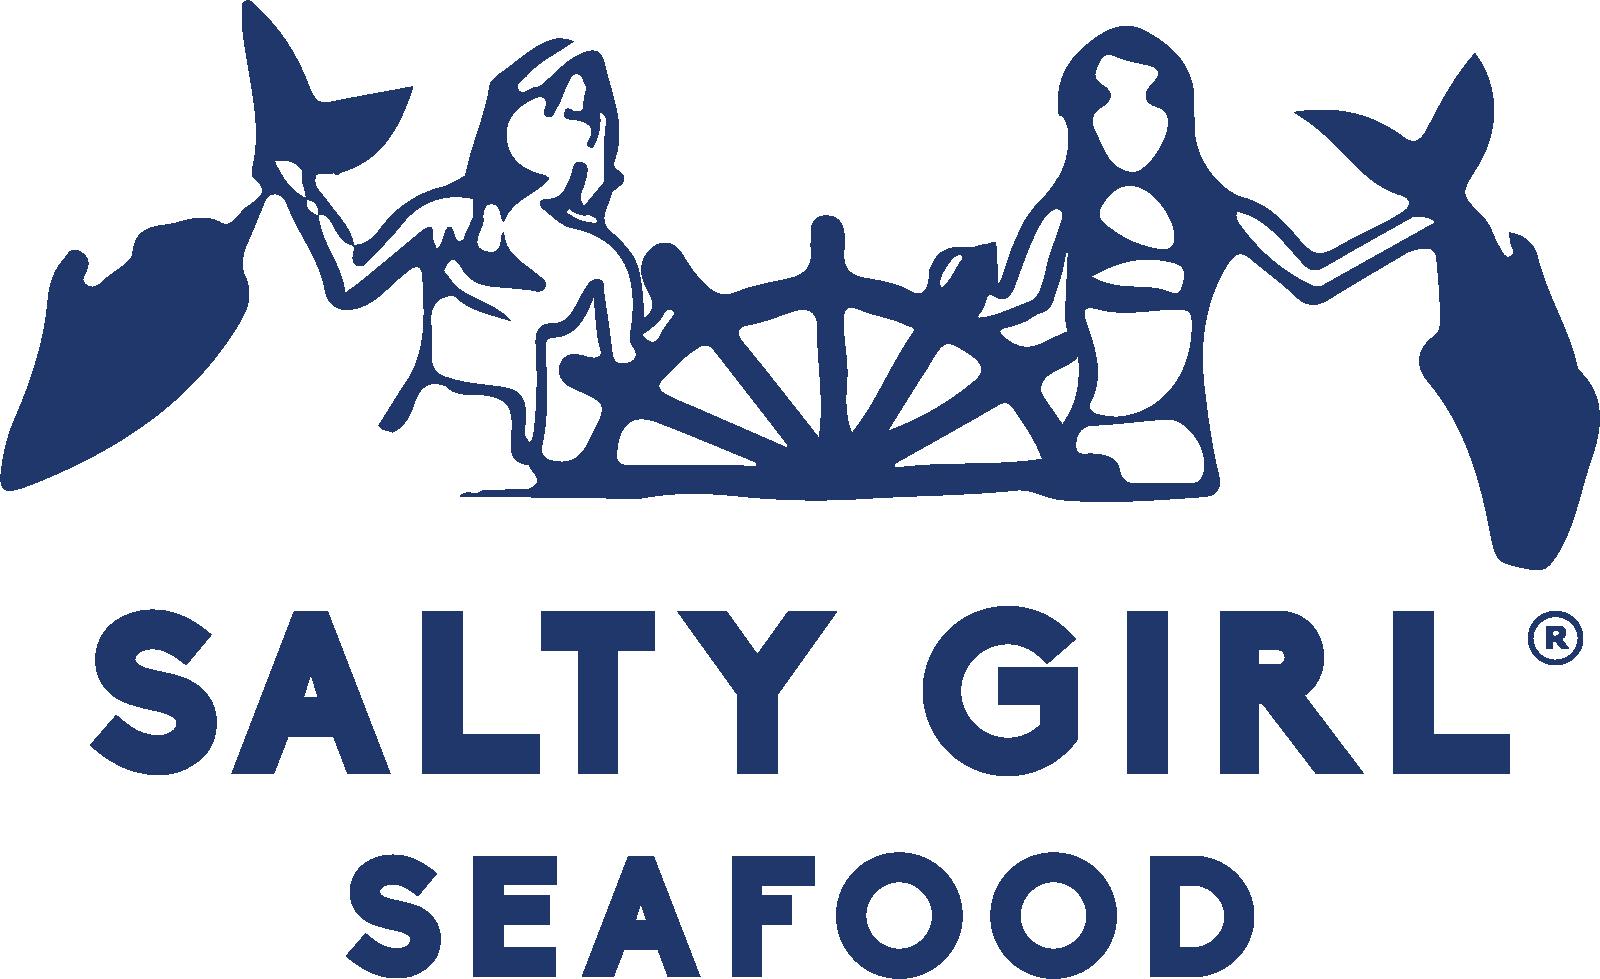 SaltyGirlSeafood_logo.png